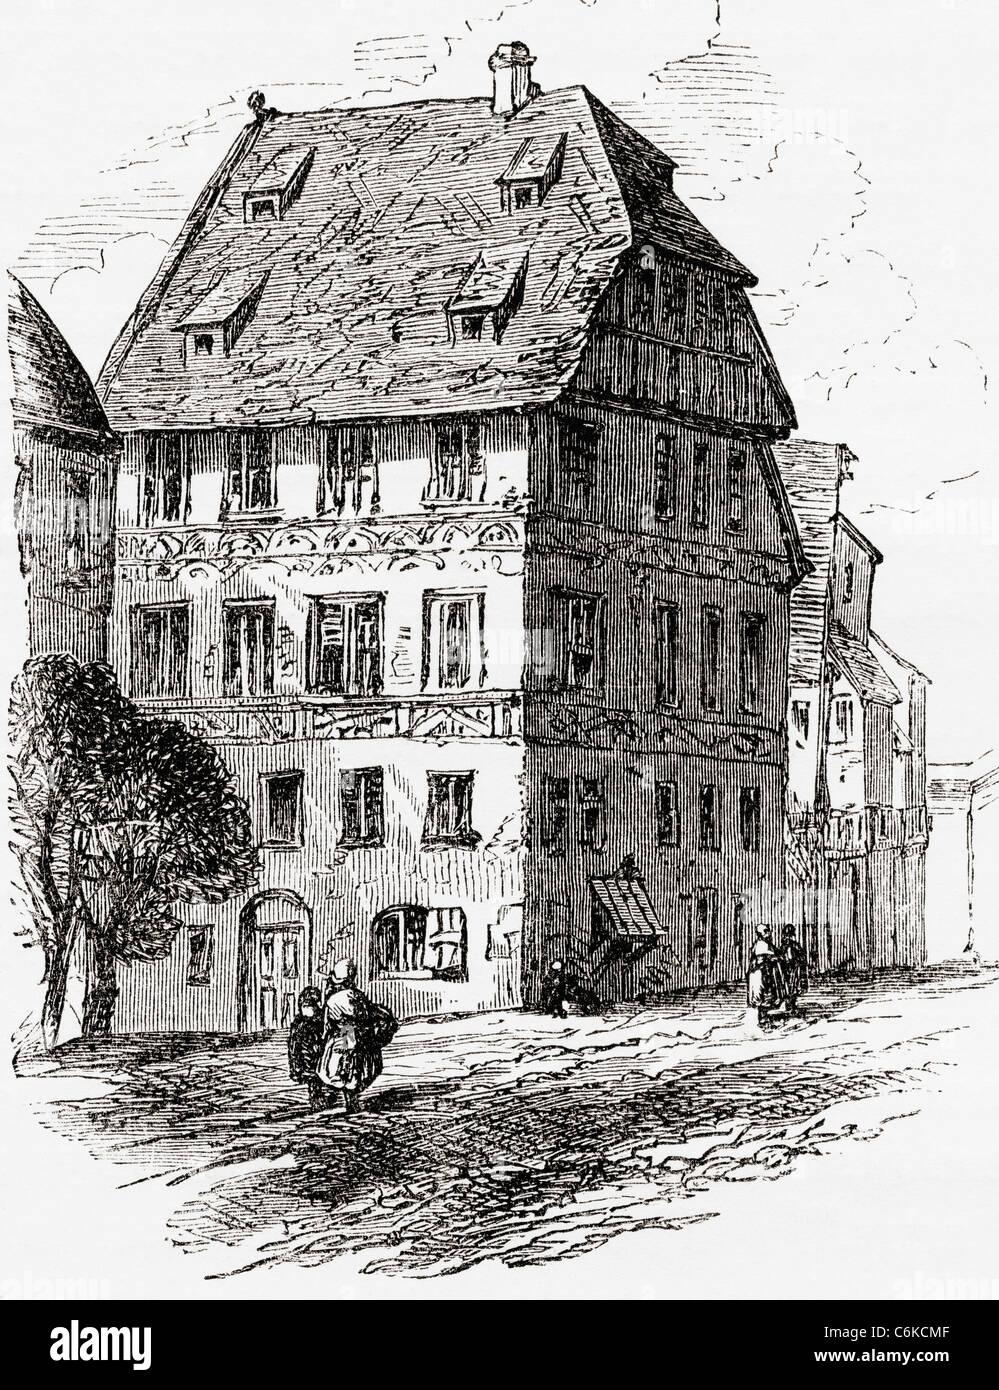 Albrecht Haus, Nürnberg, Bayern, Deutschland im 19. Jahrhundert. Stockbild